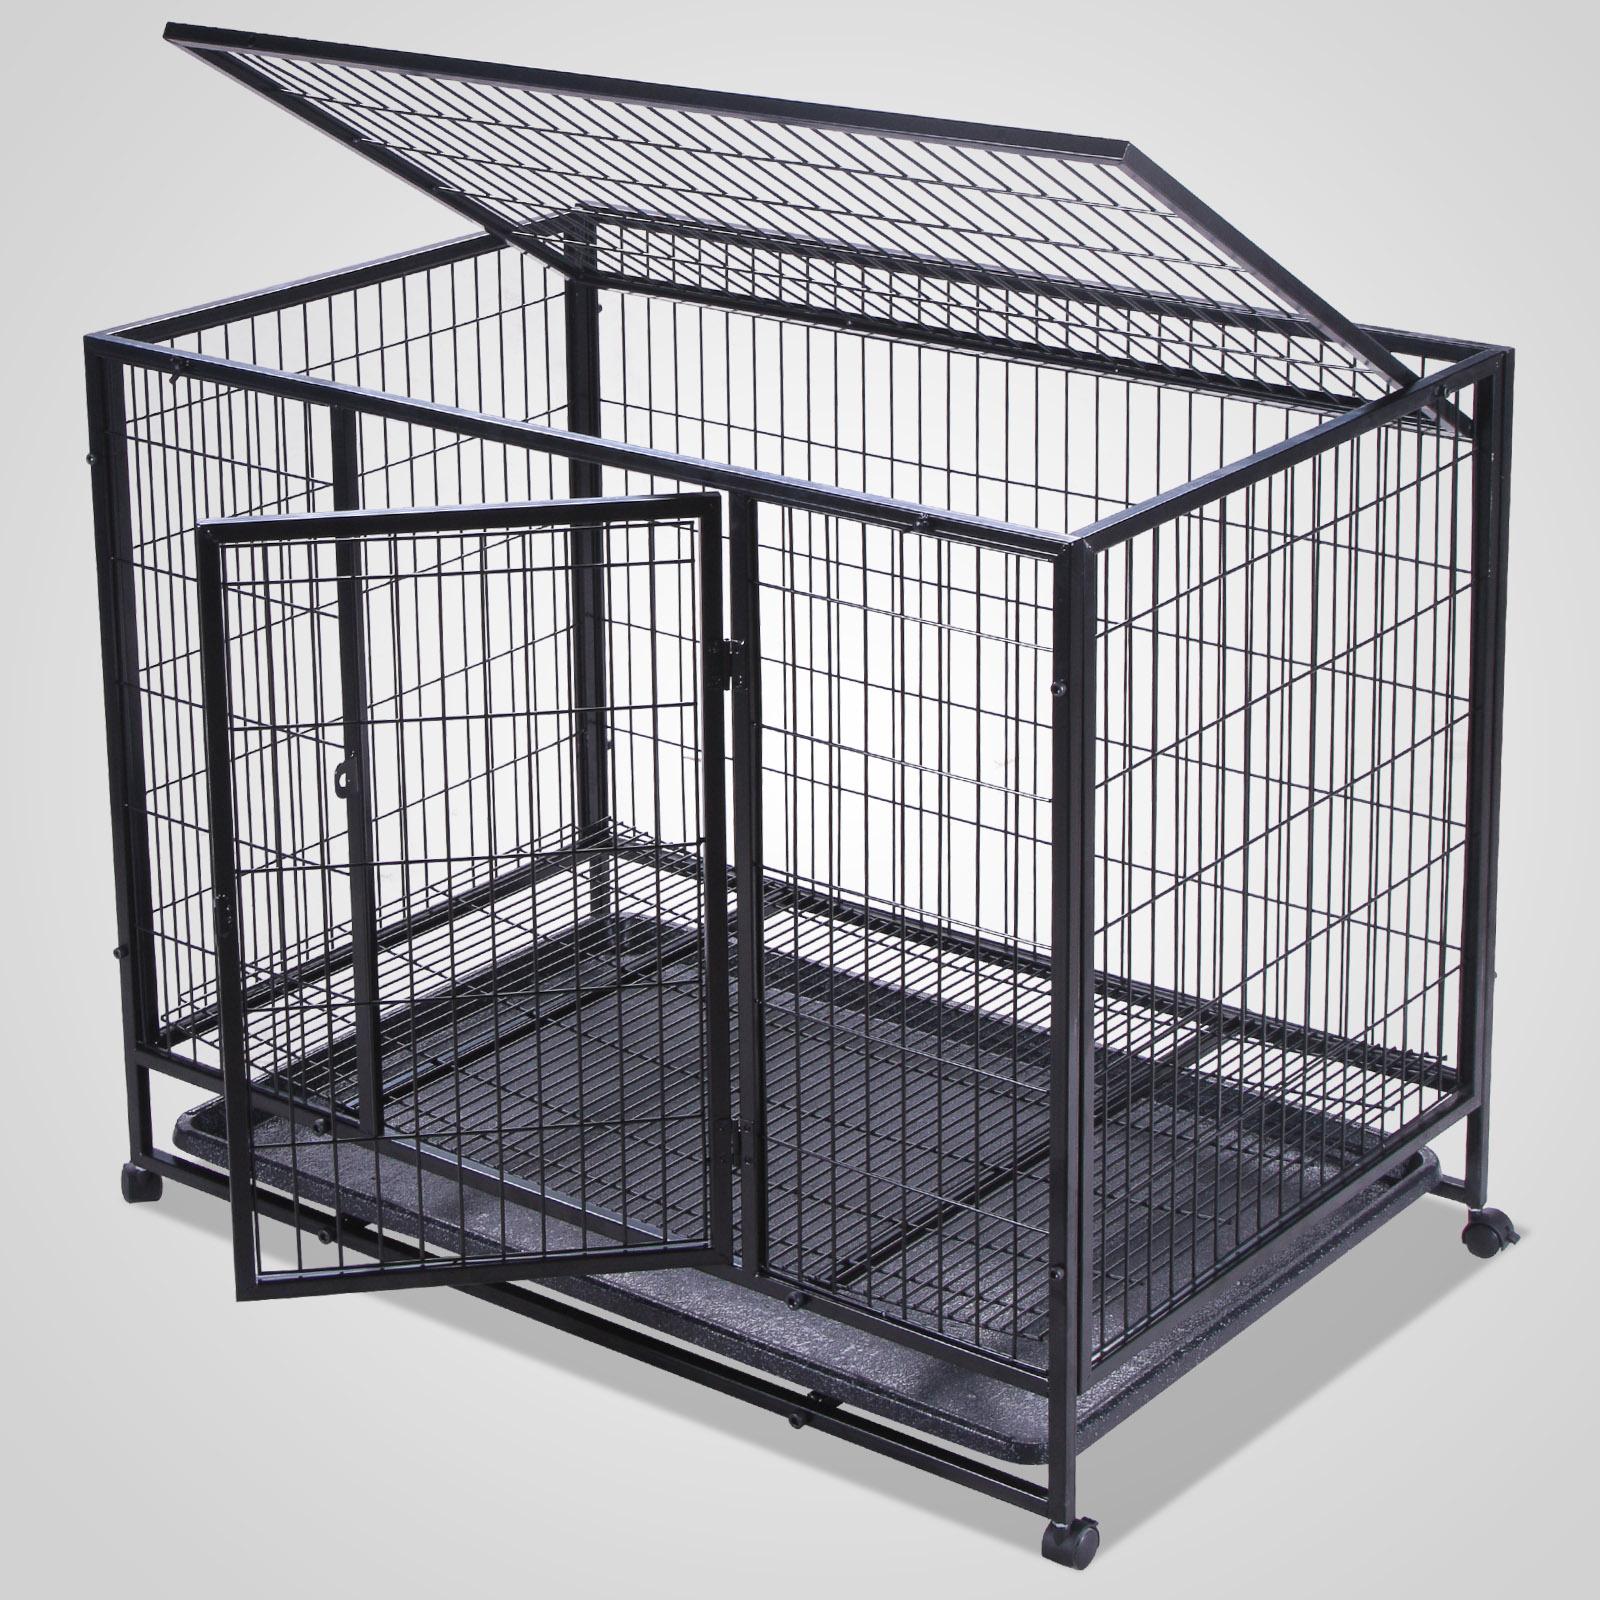 Dog Kennel Enclosures : Inch heavy duty metal dog cage double door crates